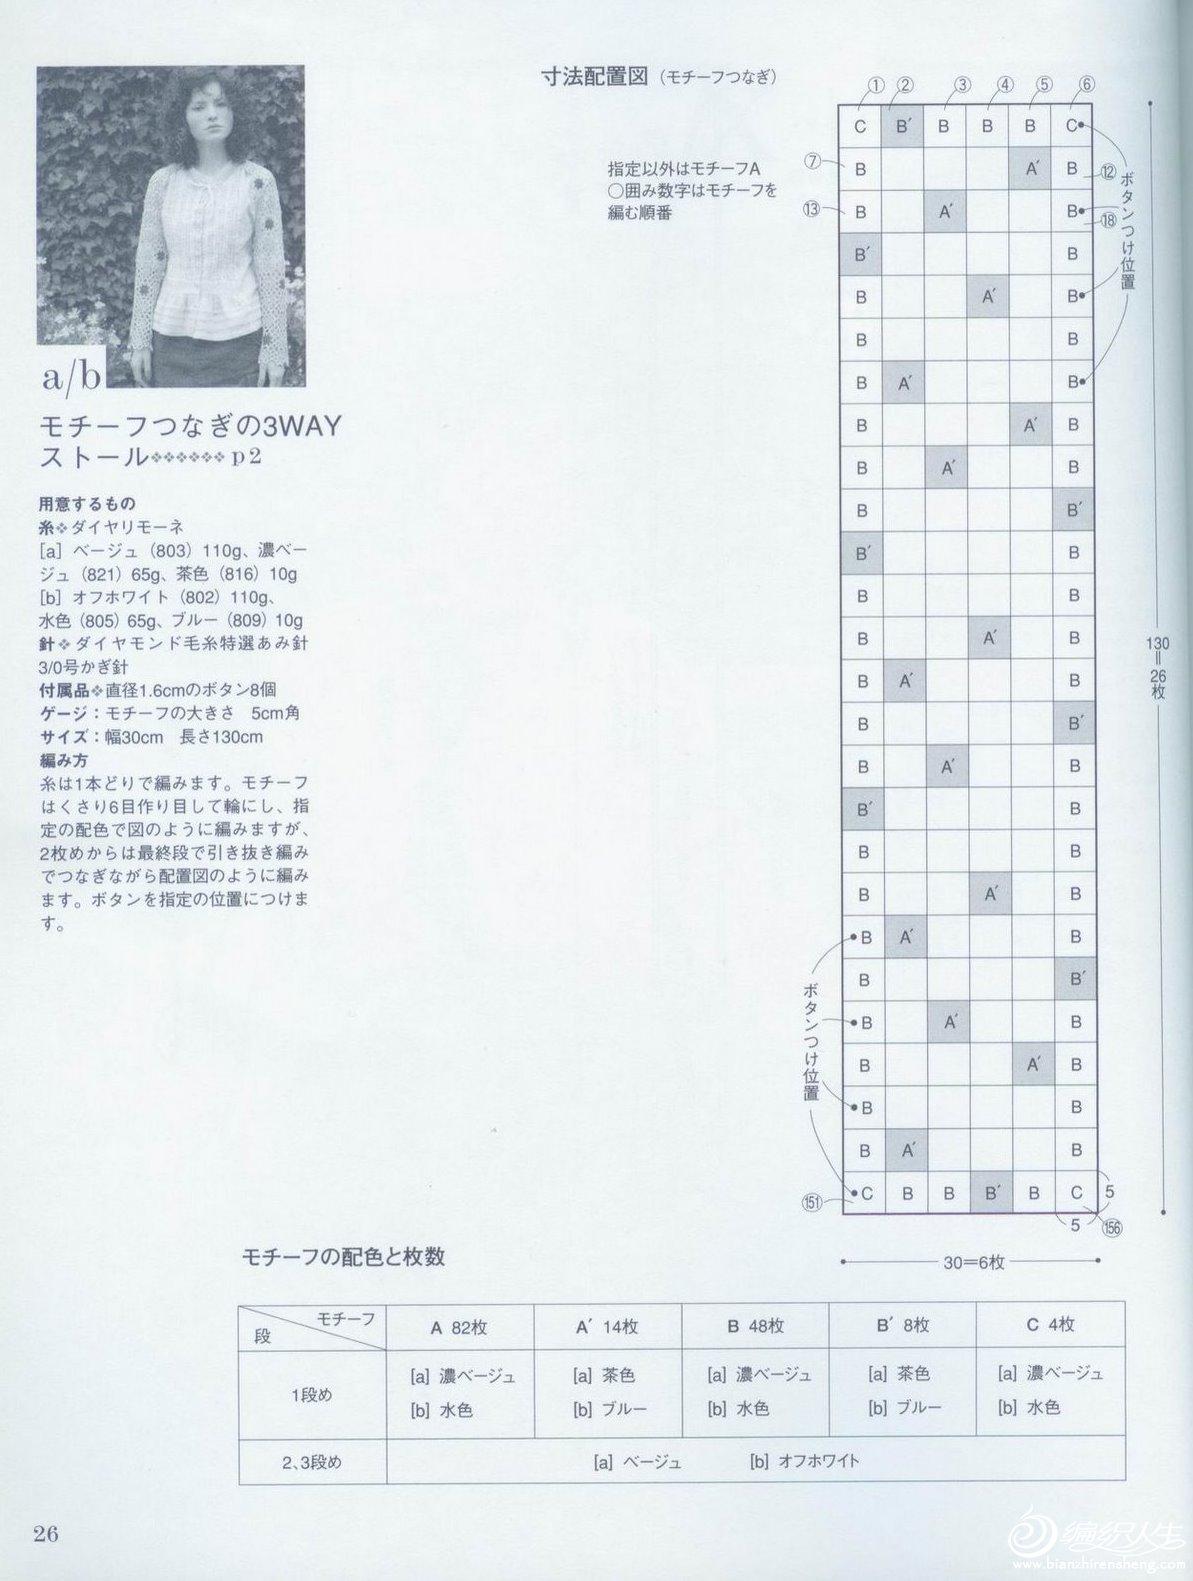 h026.jpg